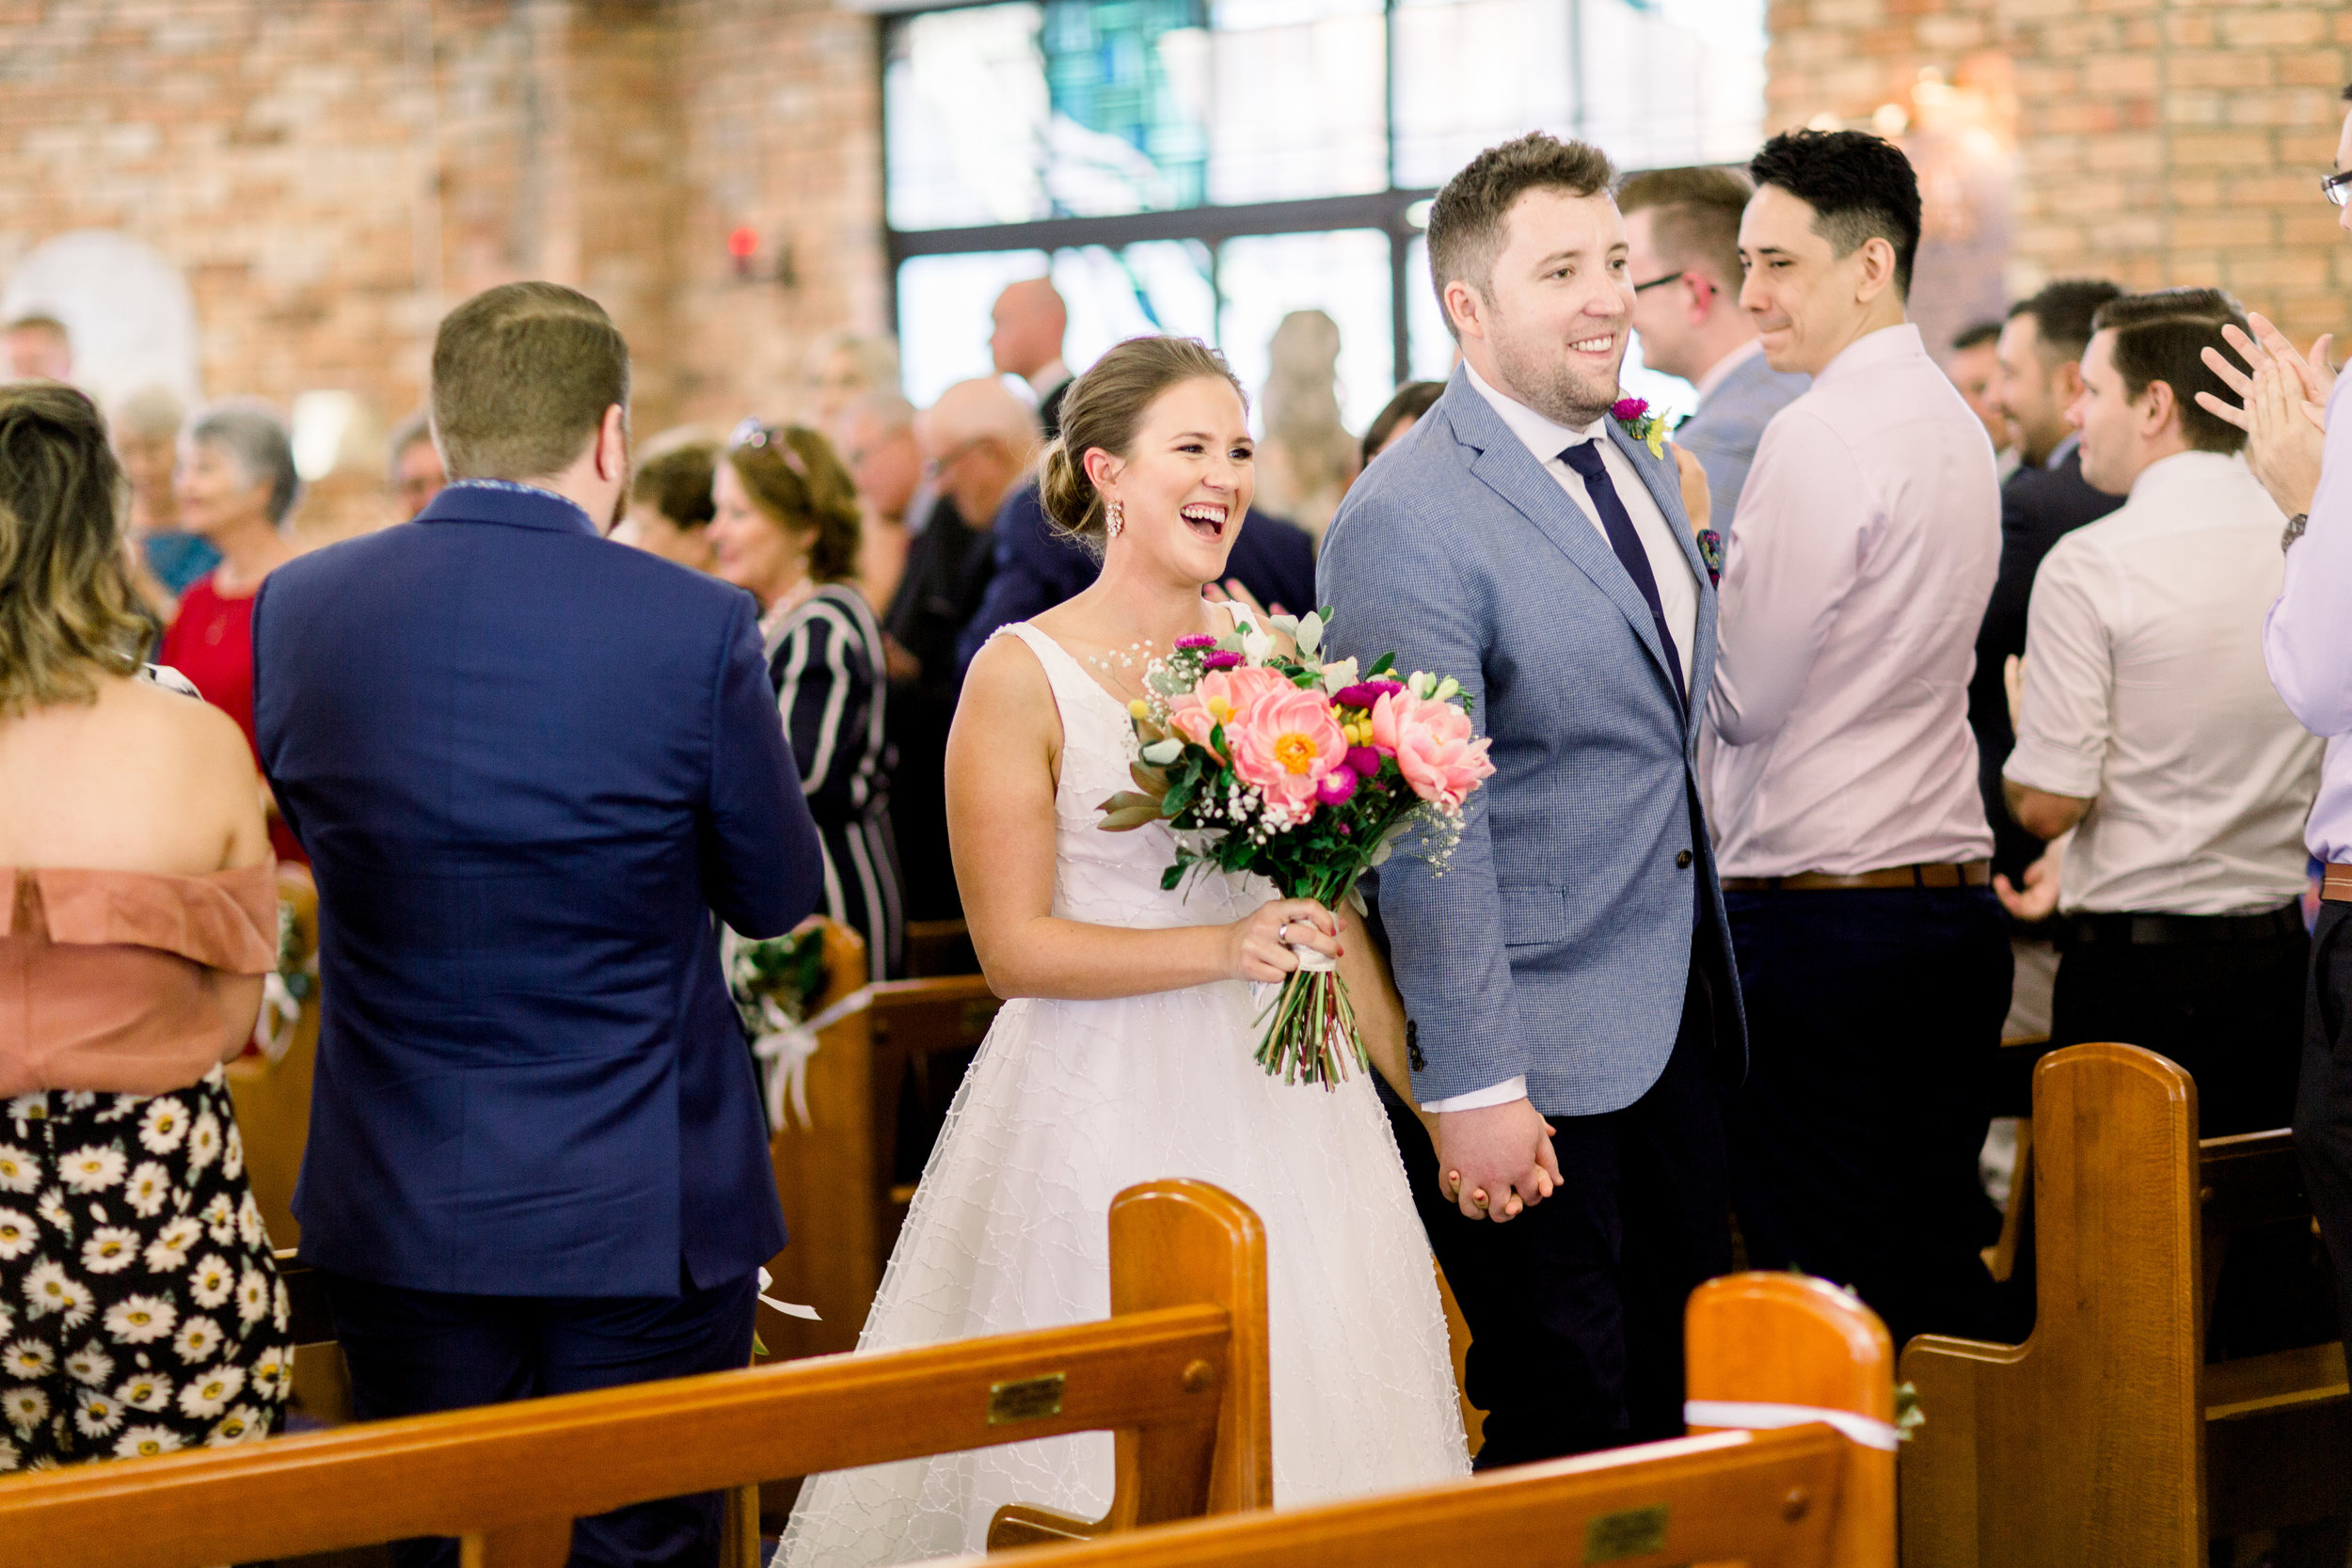 refinery-wedding-brisbane-city-wedding-photographer-47.jpg